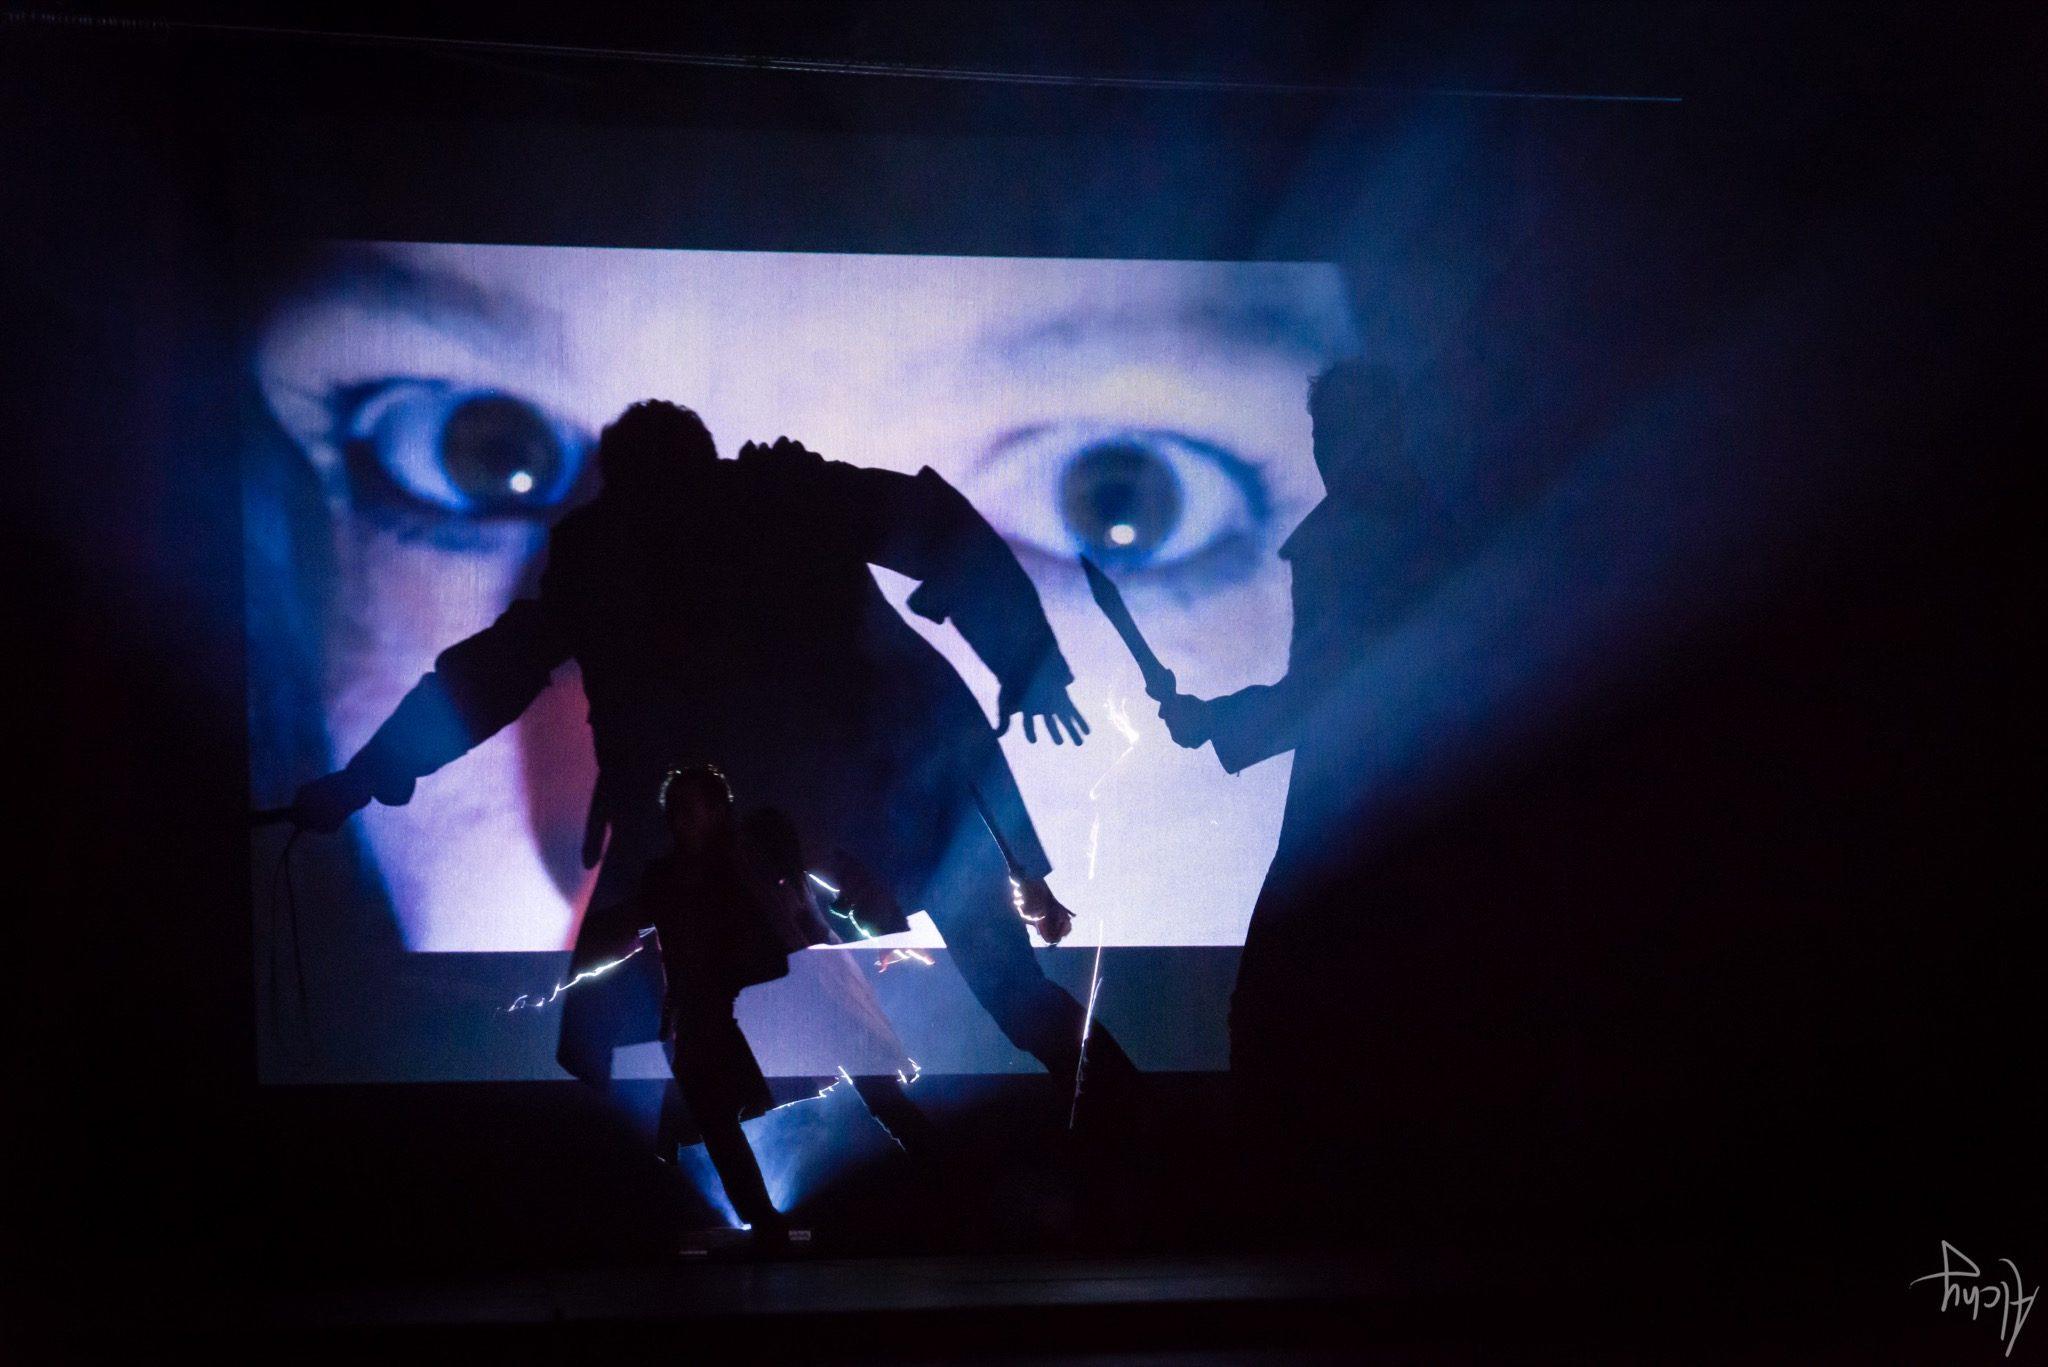 Macbeth Experience image 2